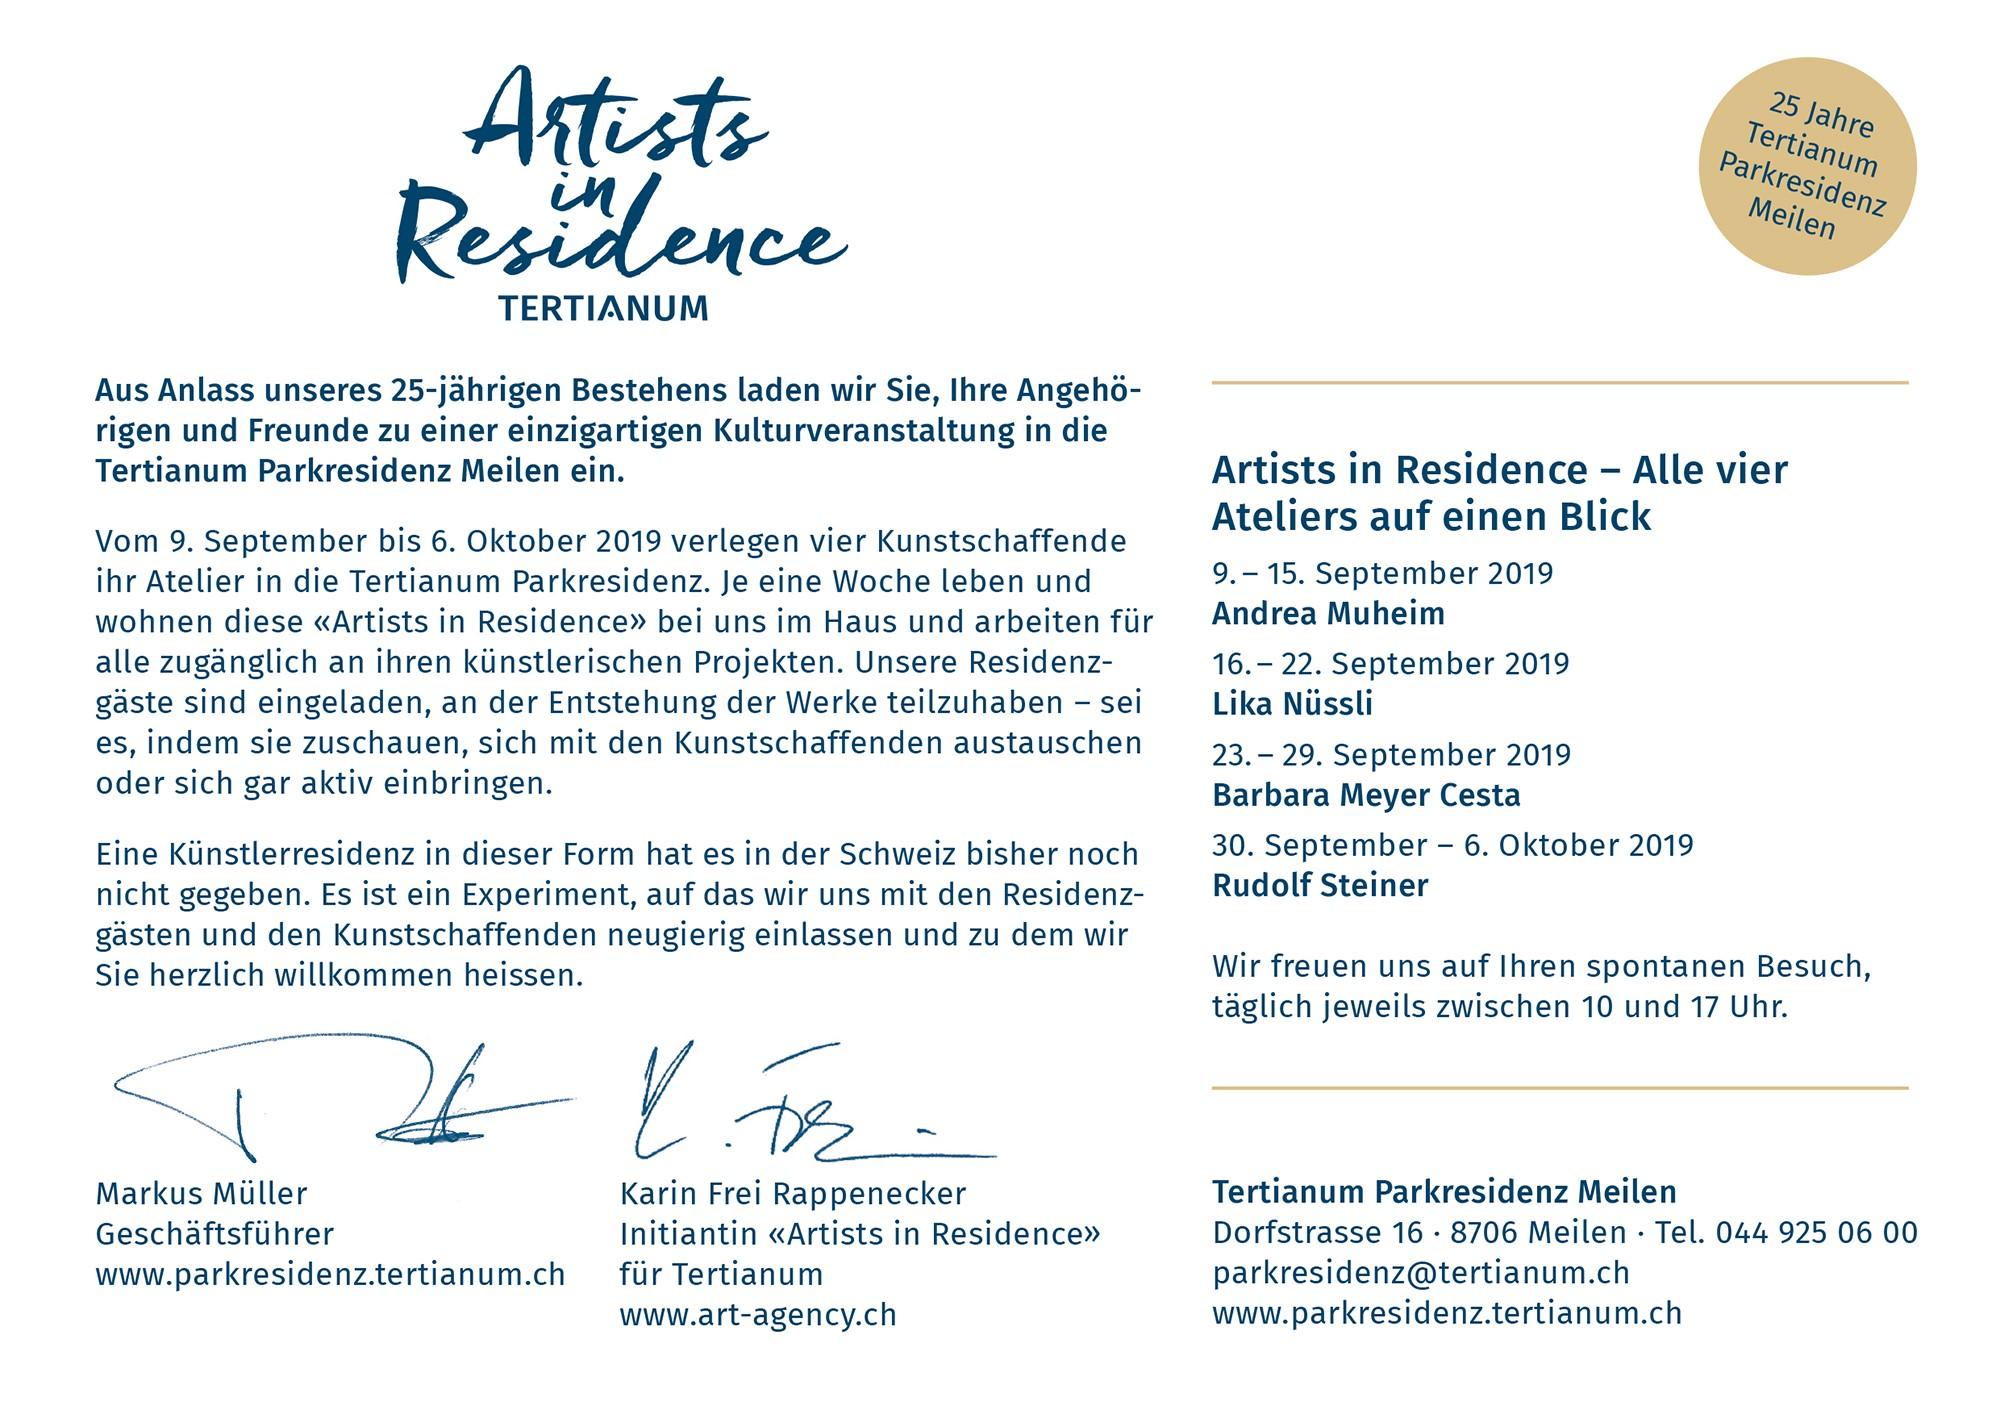 Artists in Residence; Tertianum; Parkresidenz; Meilen